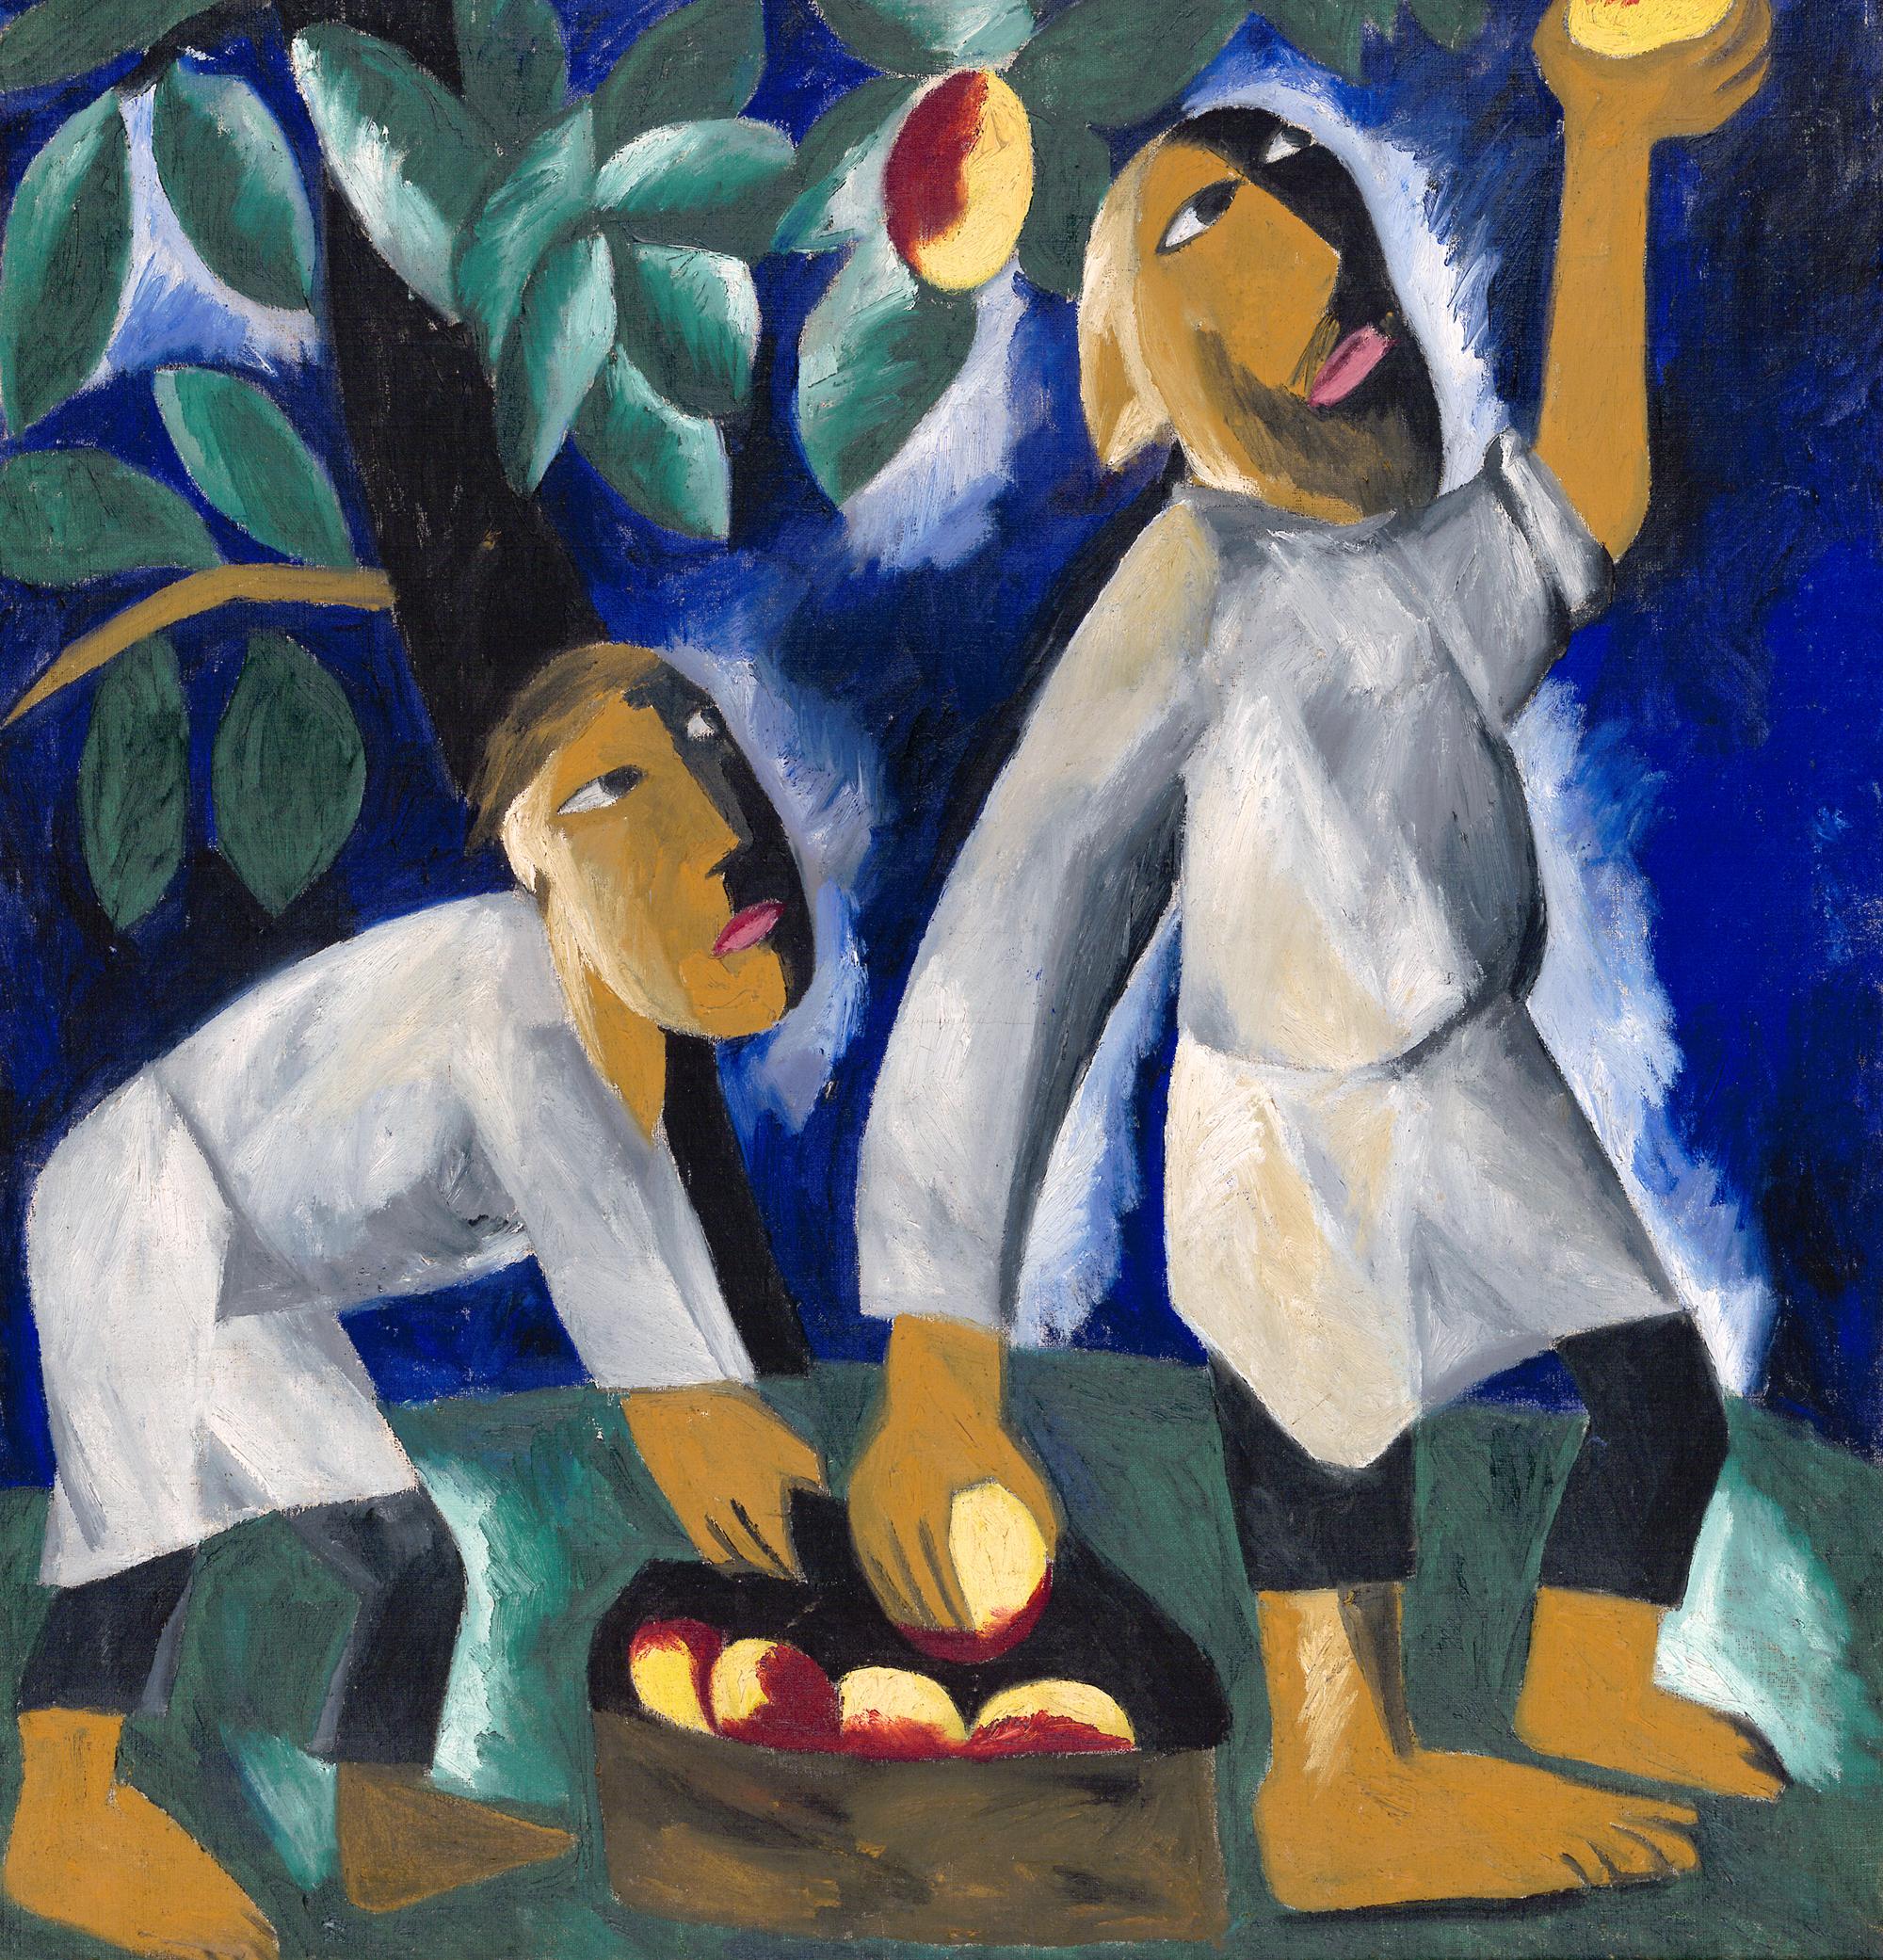 Natalia Goncharova, «Contadini che raccolgono le mele» (1911)